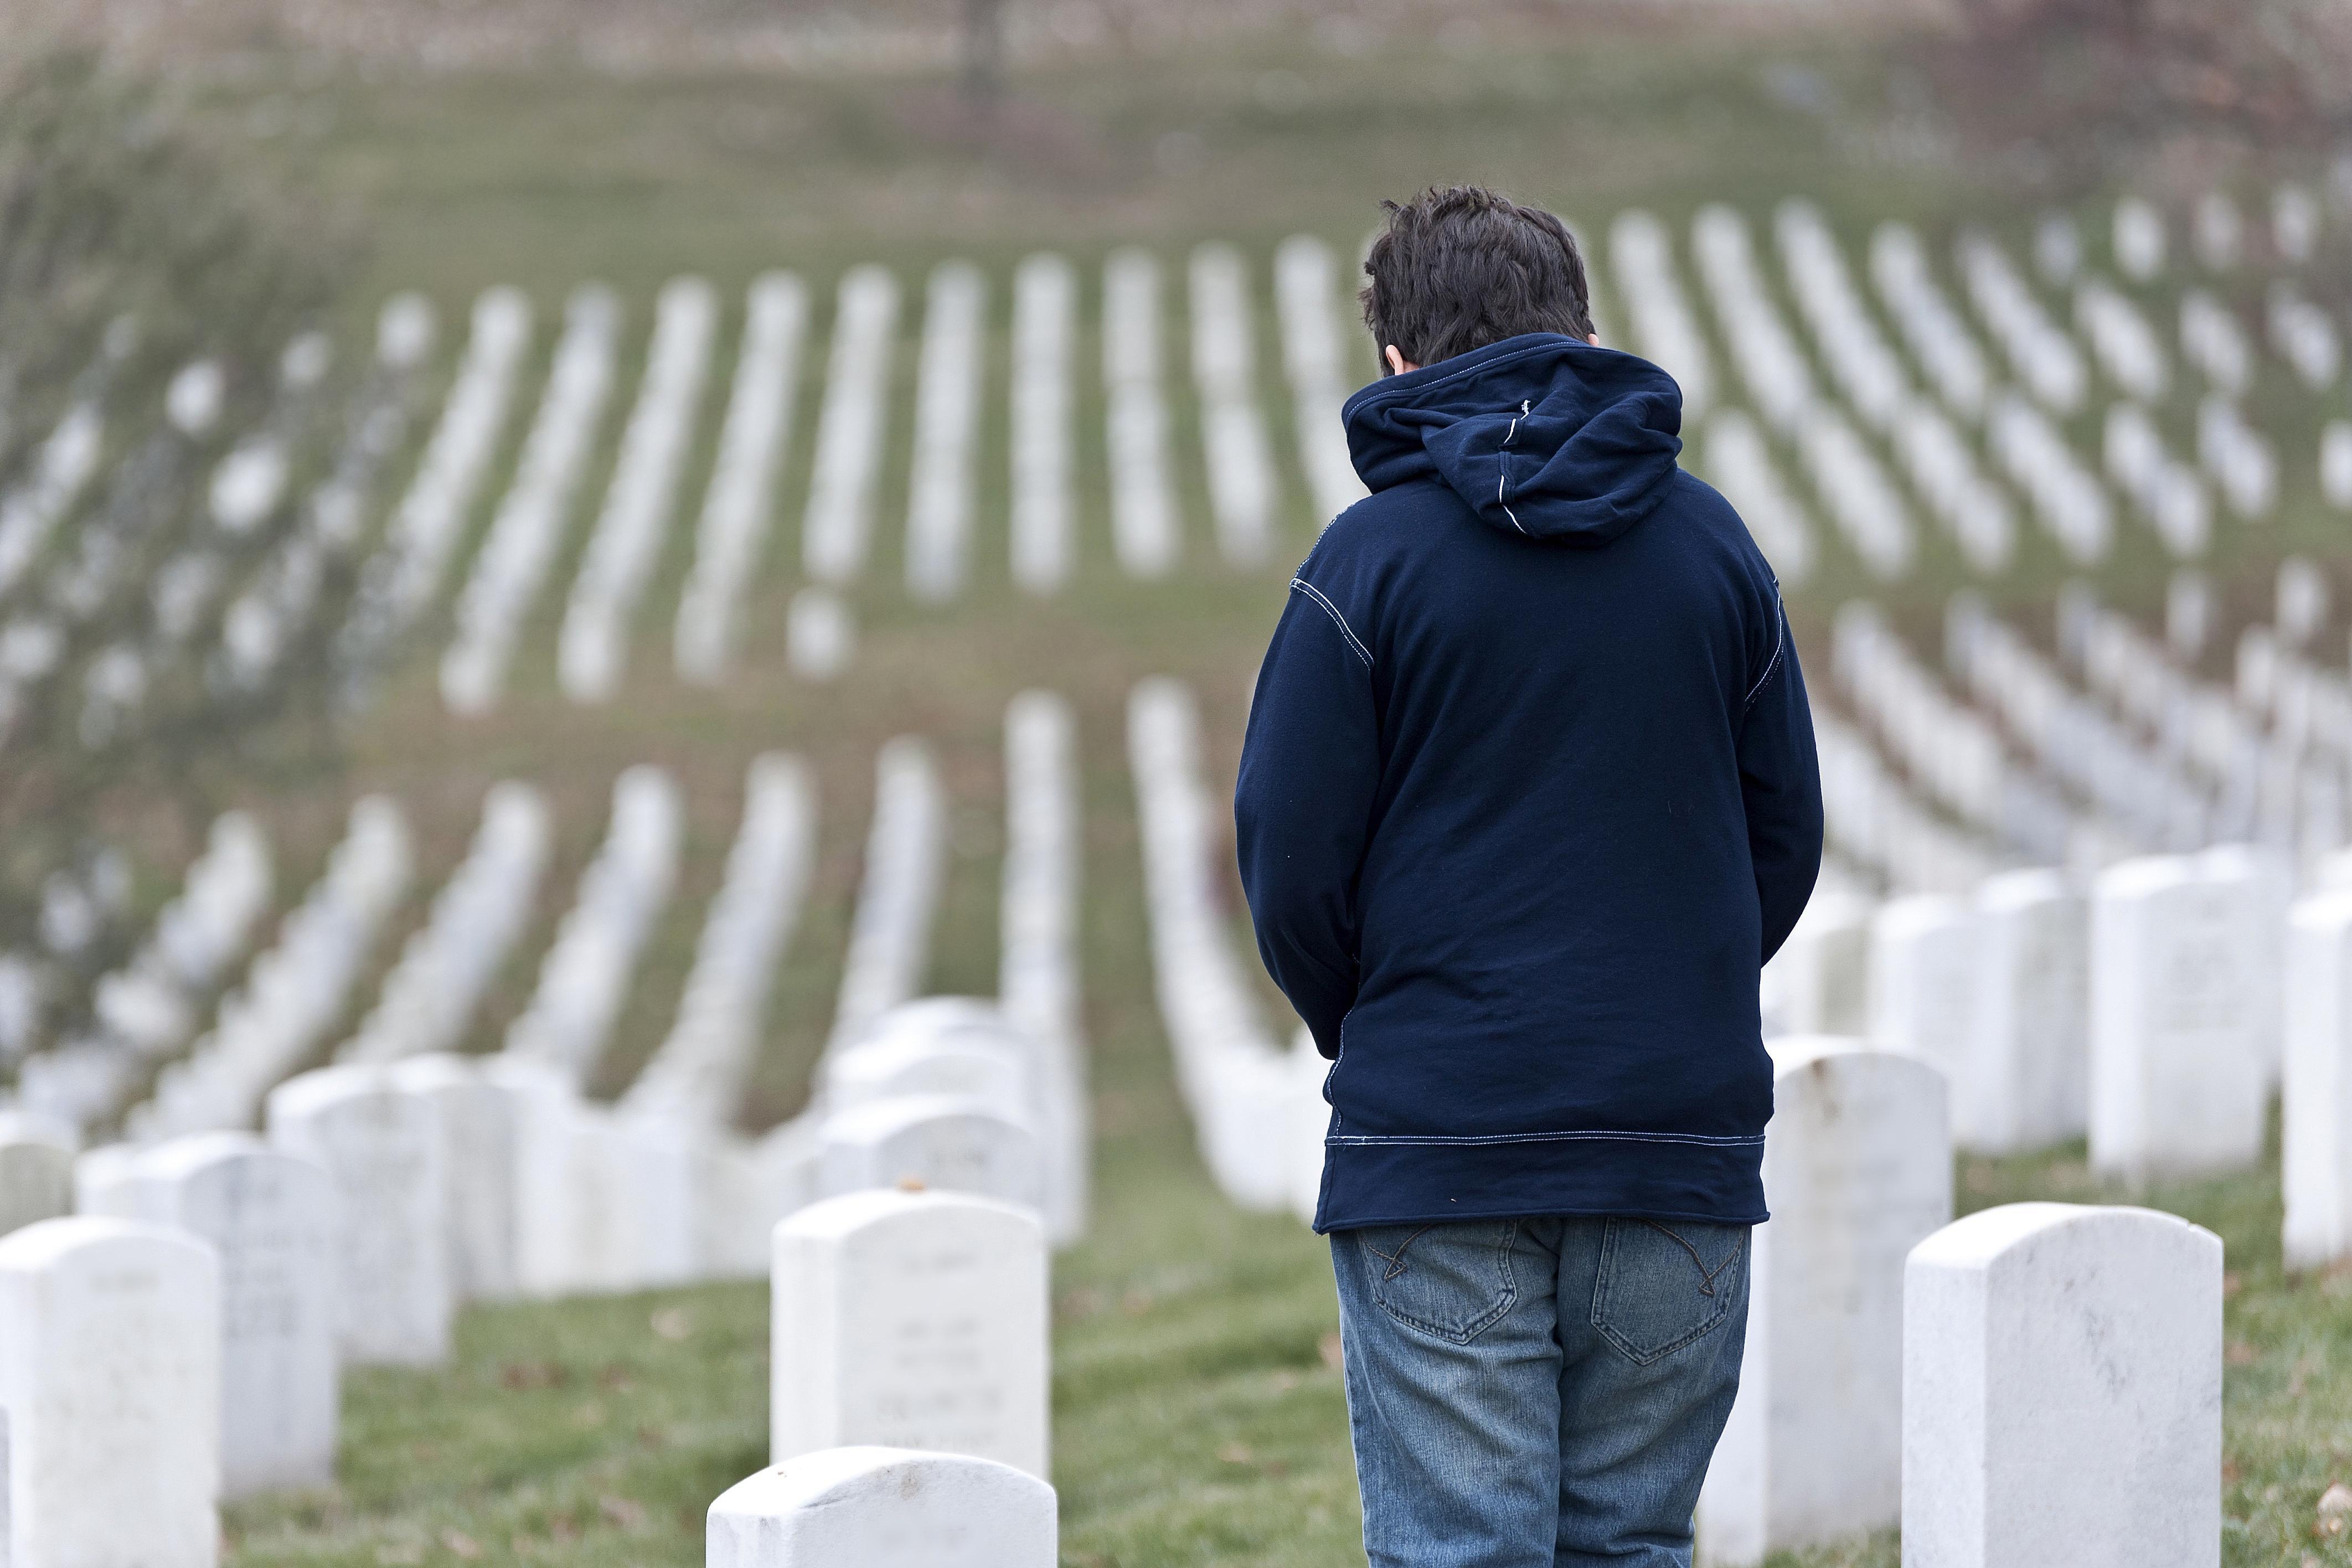 A boy in a cemetery.